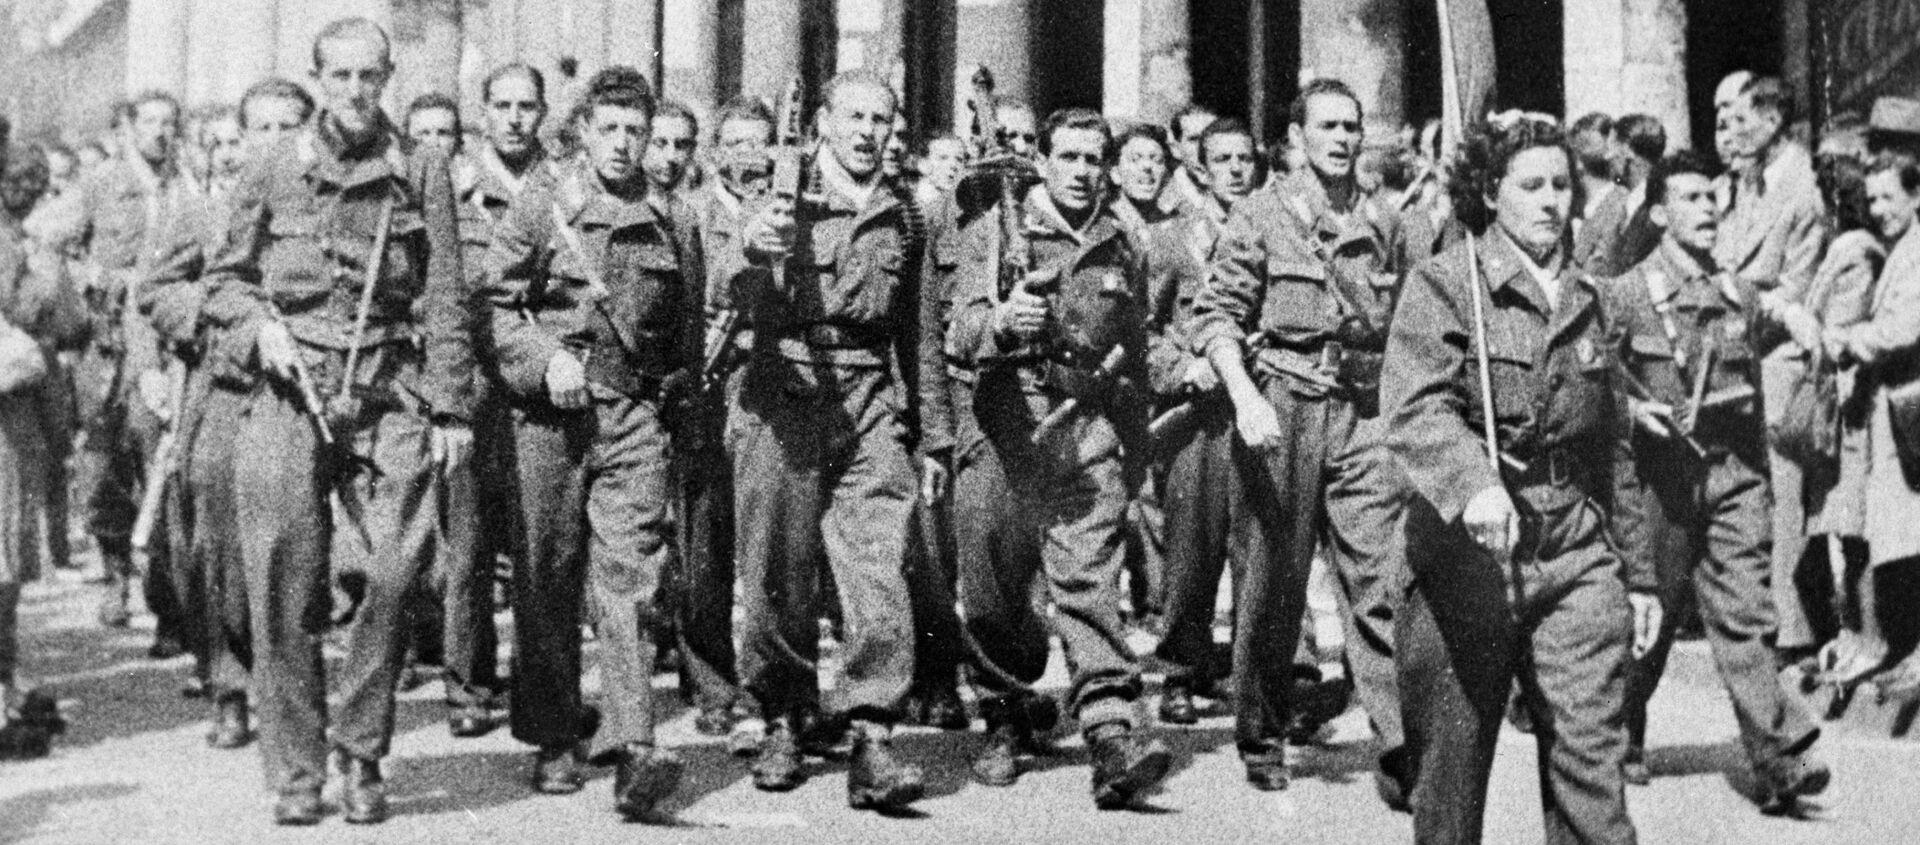 Partigiani italiani sfilano a Milano - Sputnik Italia, 1920, 22.03.2020